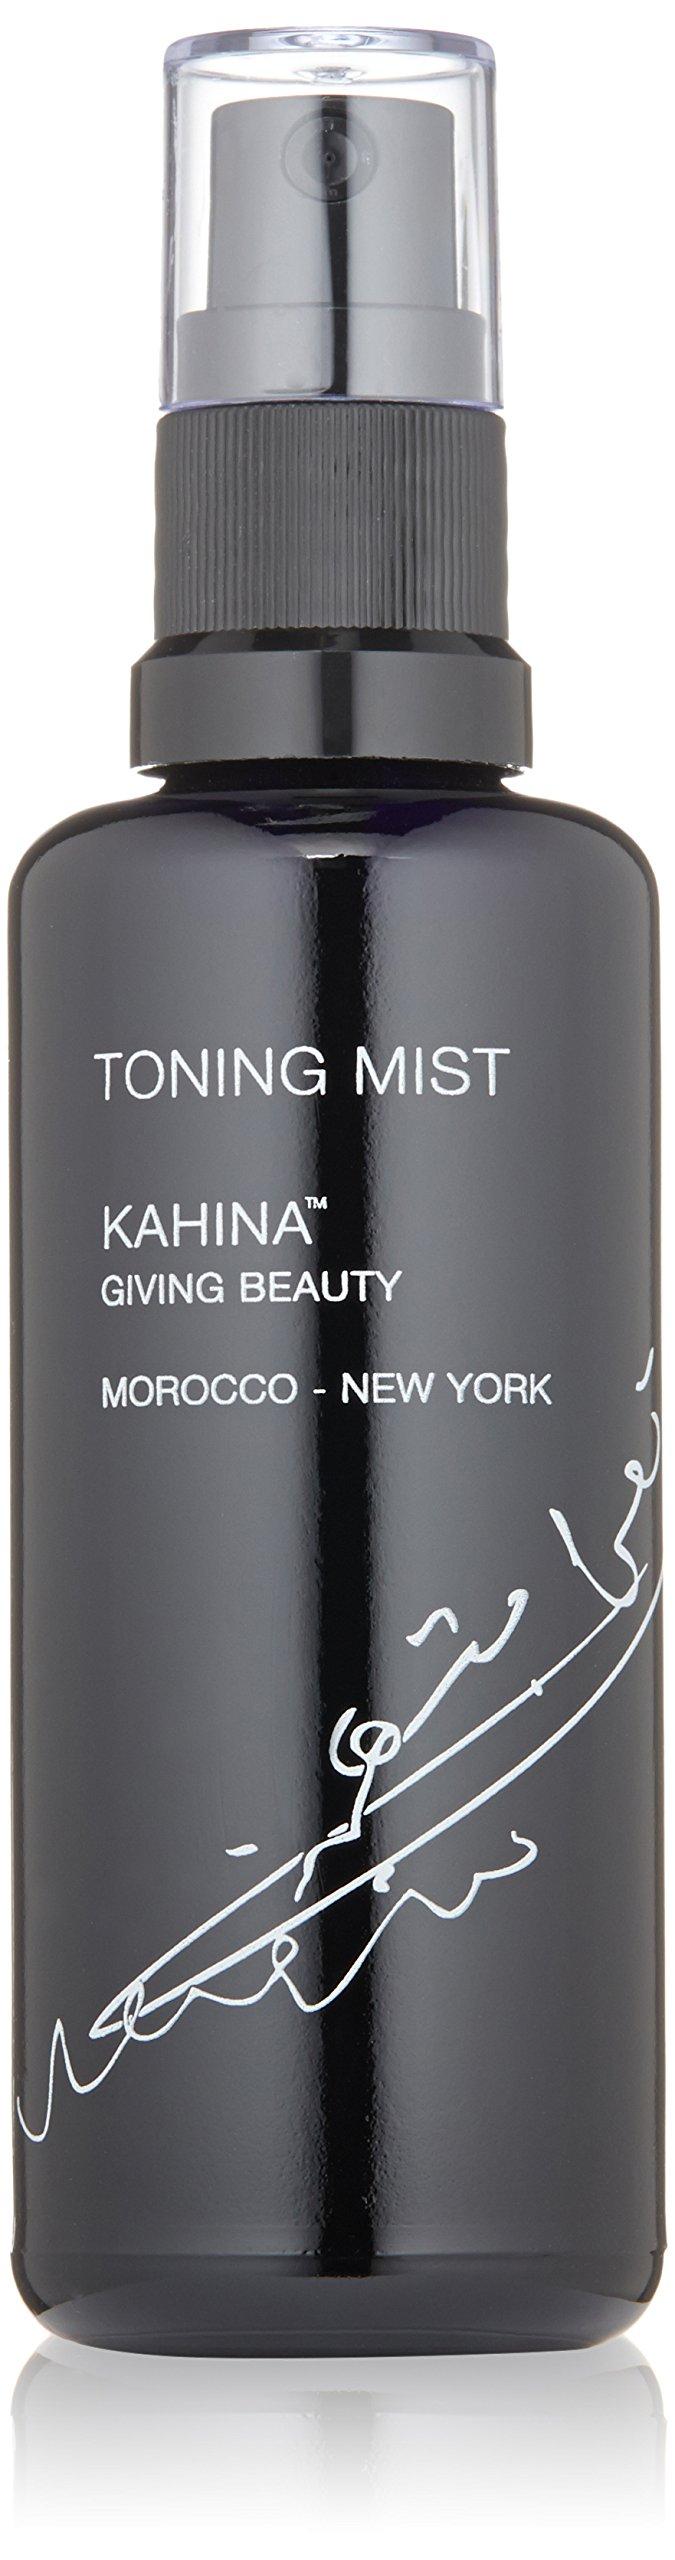 Kahina Giving Beauty Toning Mist, 1.6 Oz